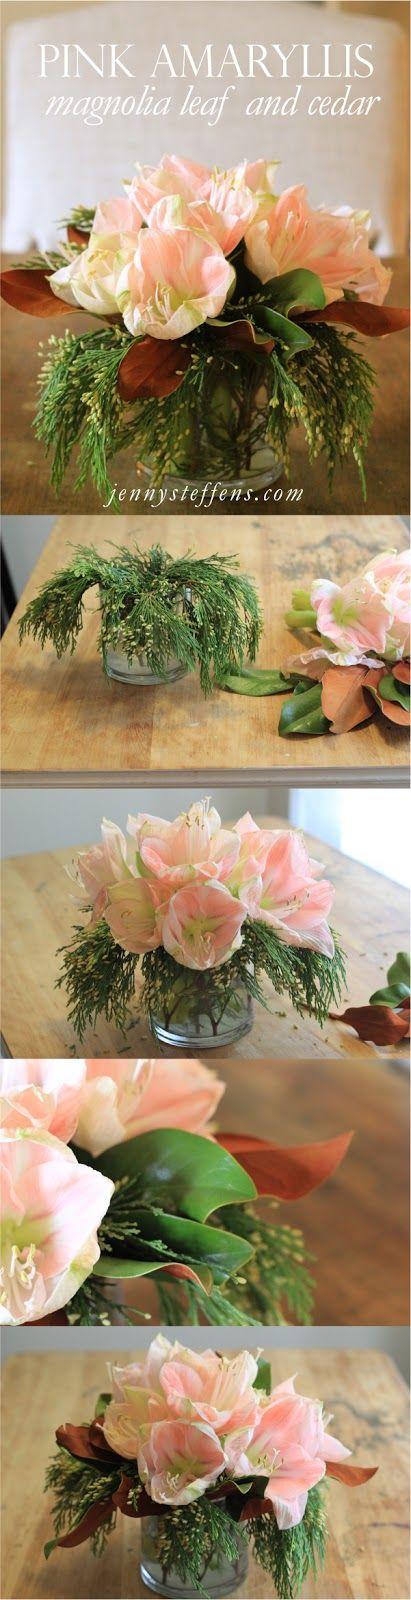 Jenny Steffens Hobick: Easy DIY Holiday Centerpiece : Pale Pink Amaryllis, Magnolia Leaf & Cedar Flower Arrangement